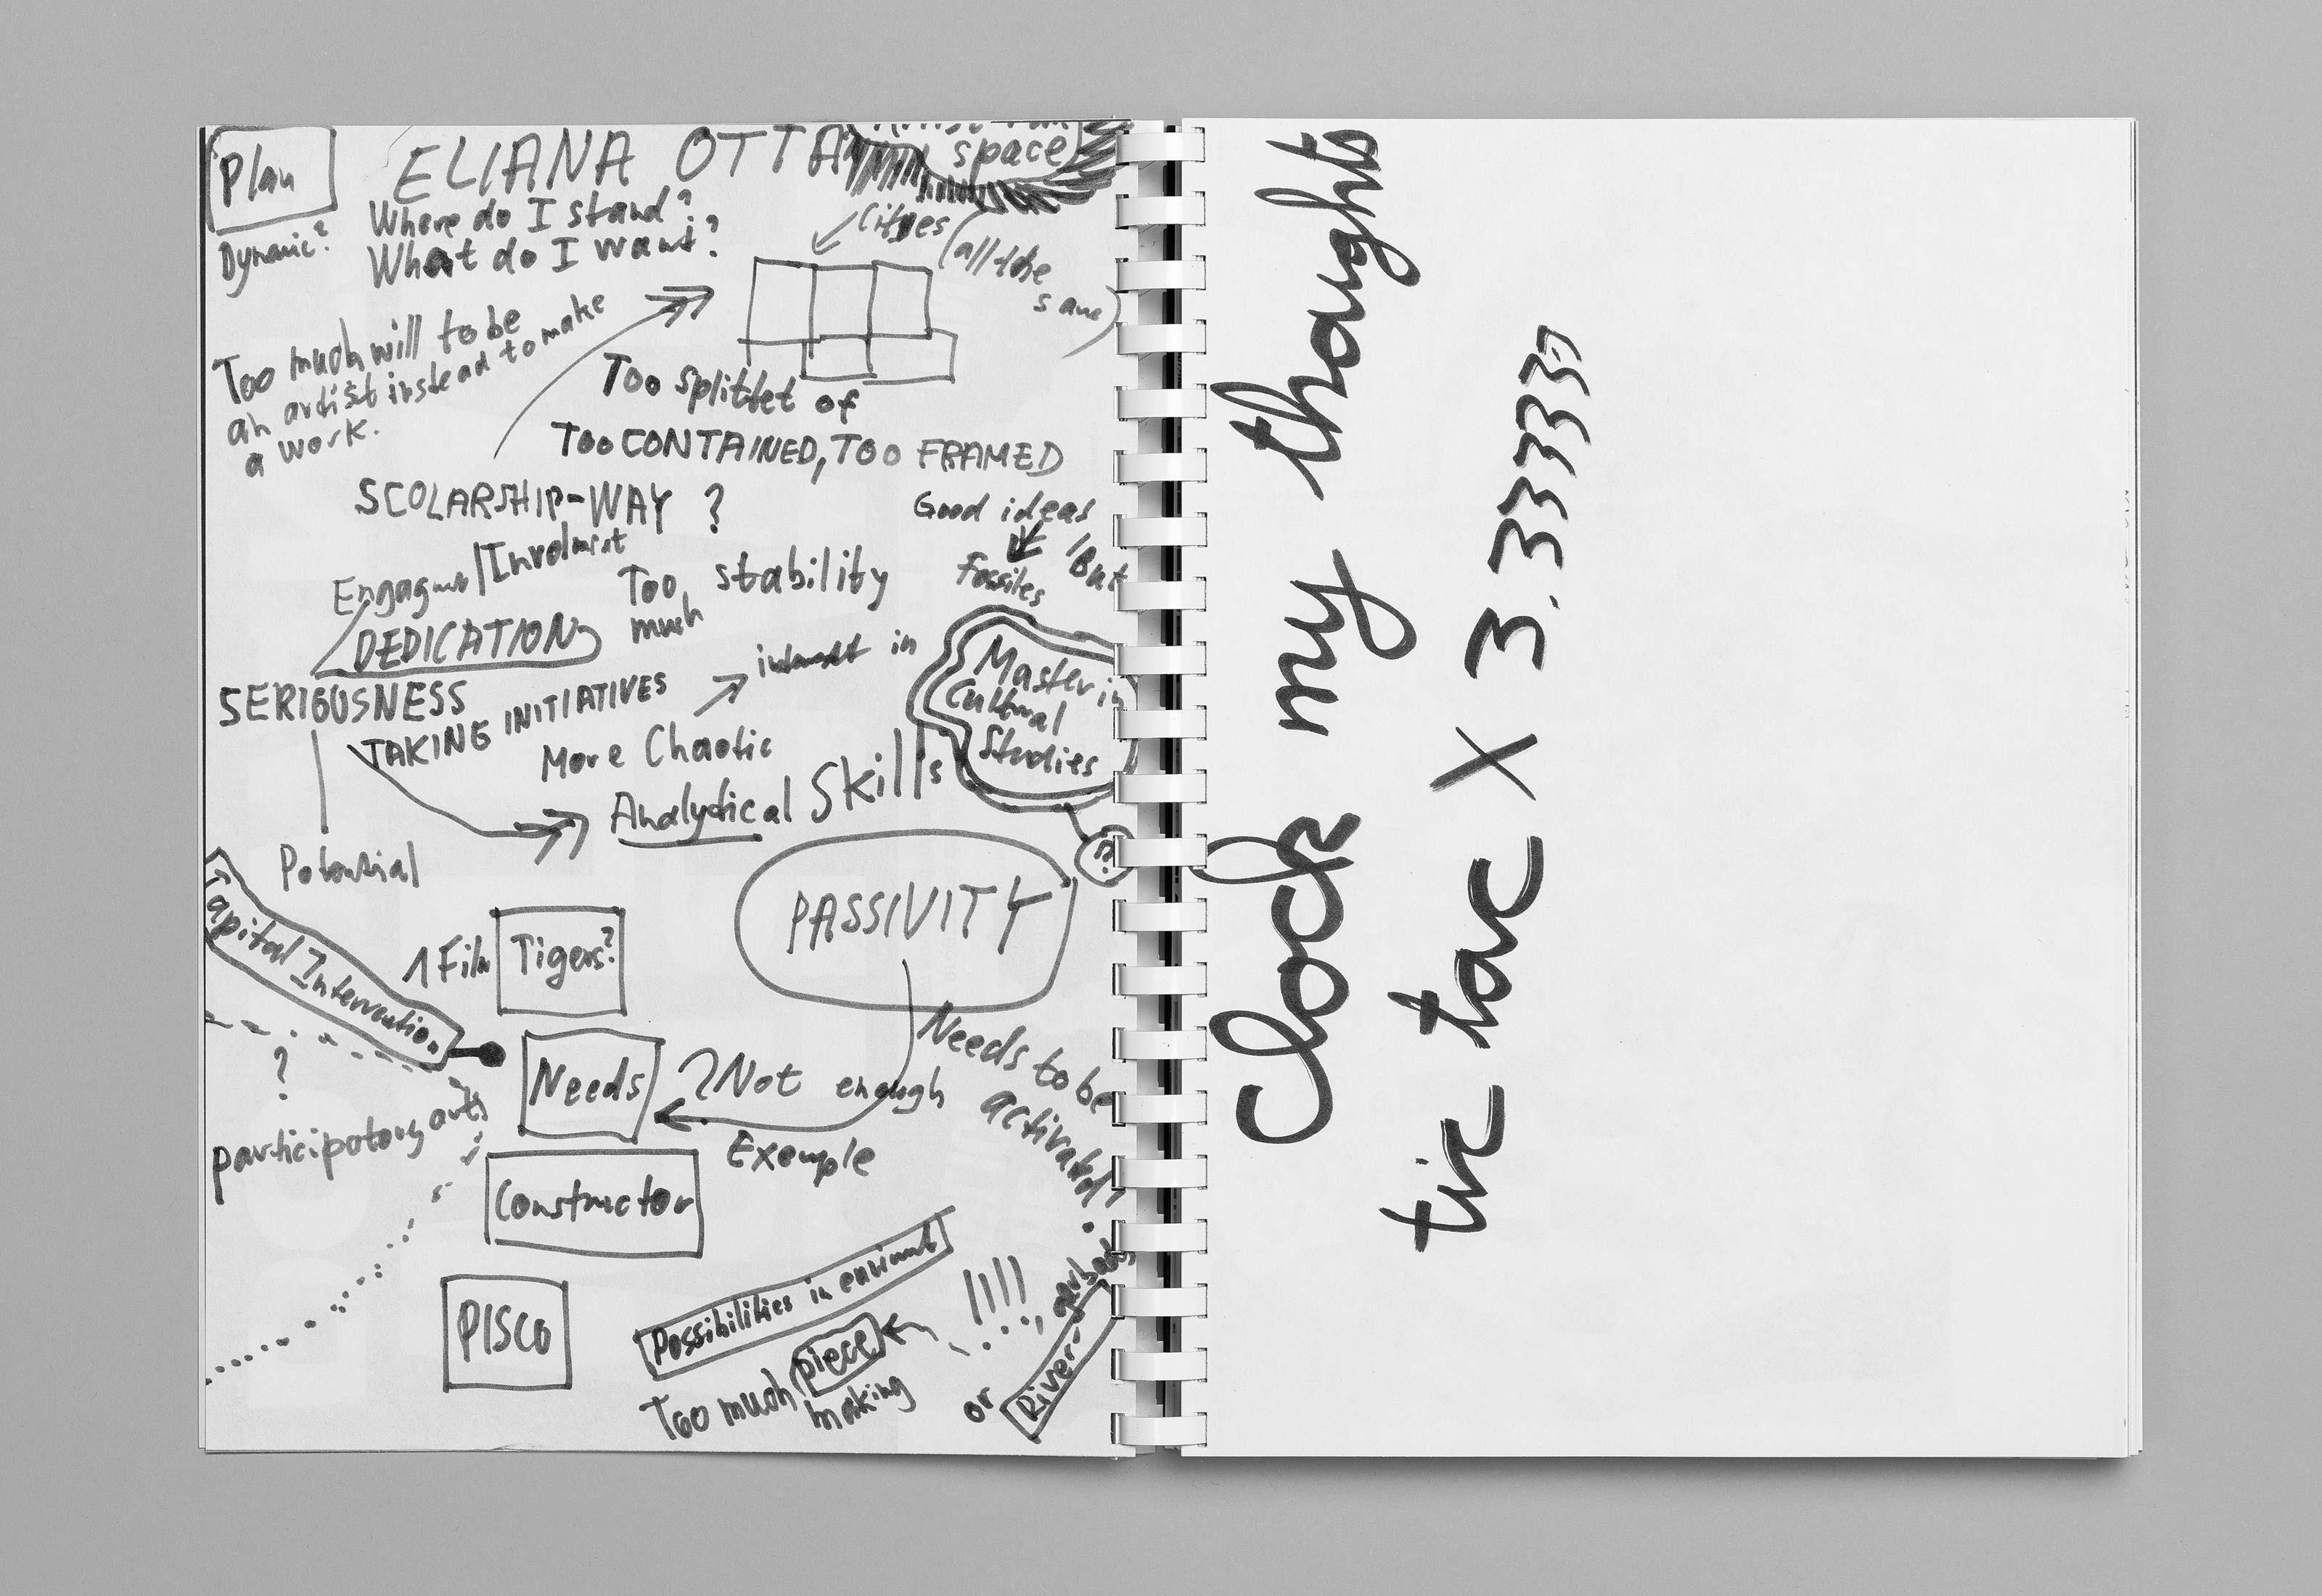 Sommerakademie im Zentrum Paul Klee 2016 – Publikation Thomas Hirschhorn, 02  ©Atelier Pol